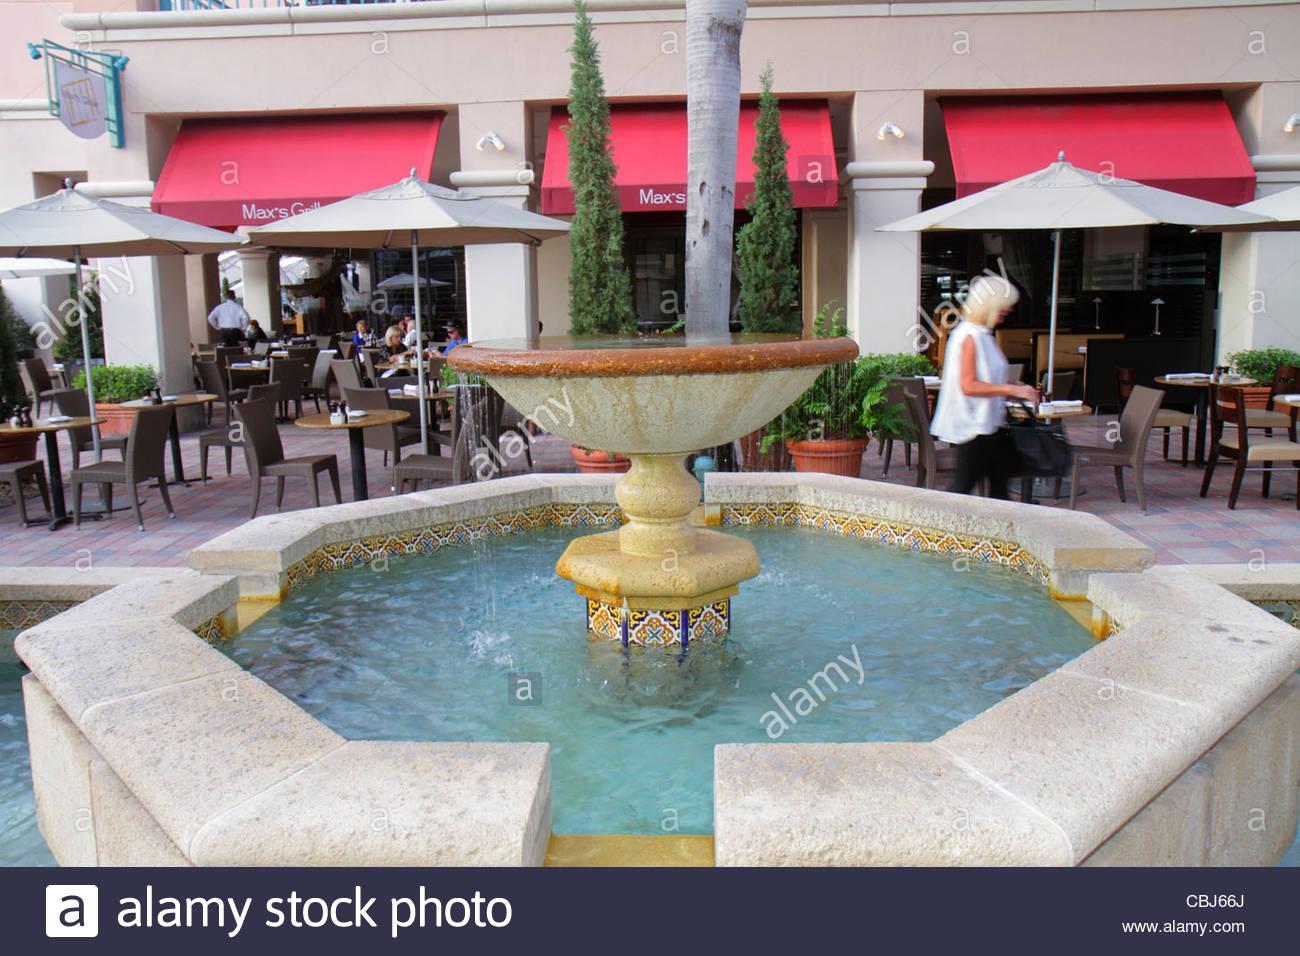 Boca Raton Florida Mizner Park Plaza Real Shopping Dining